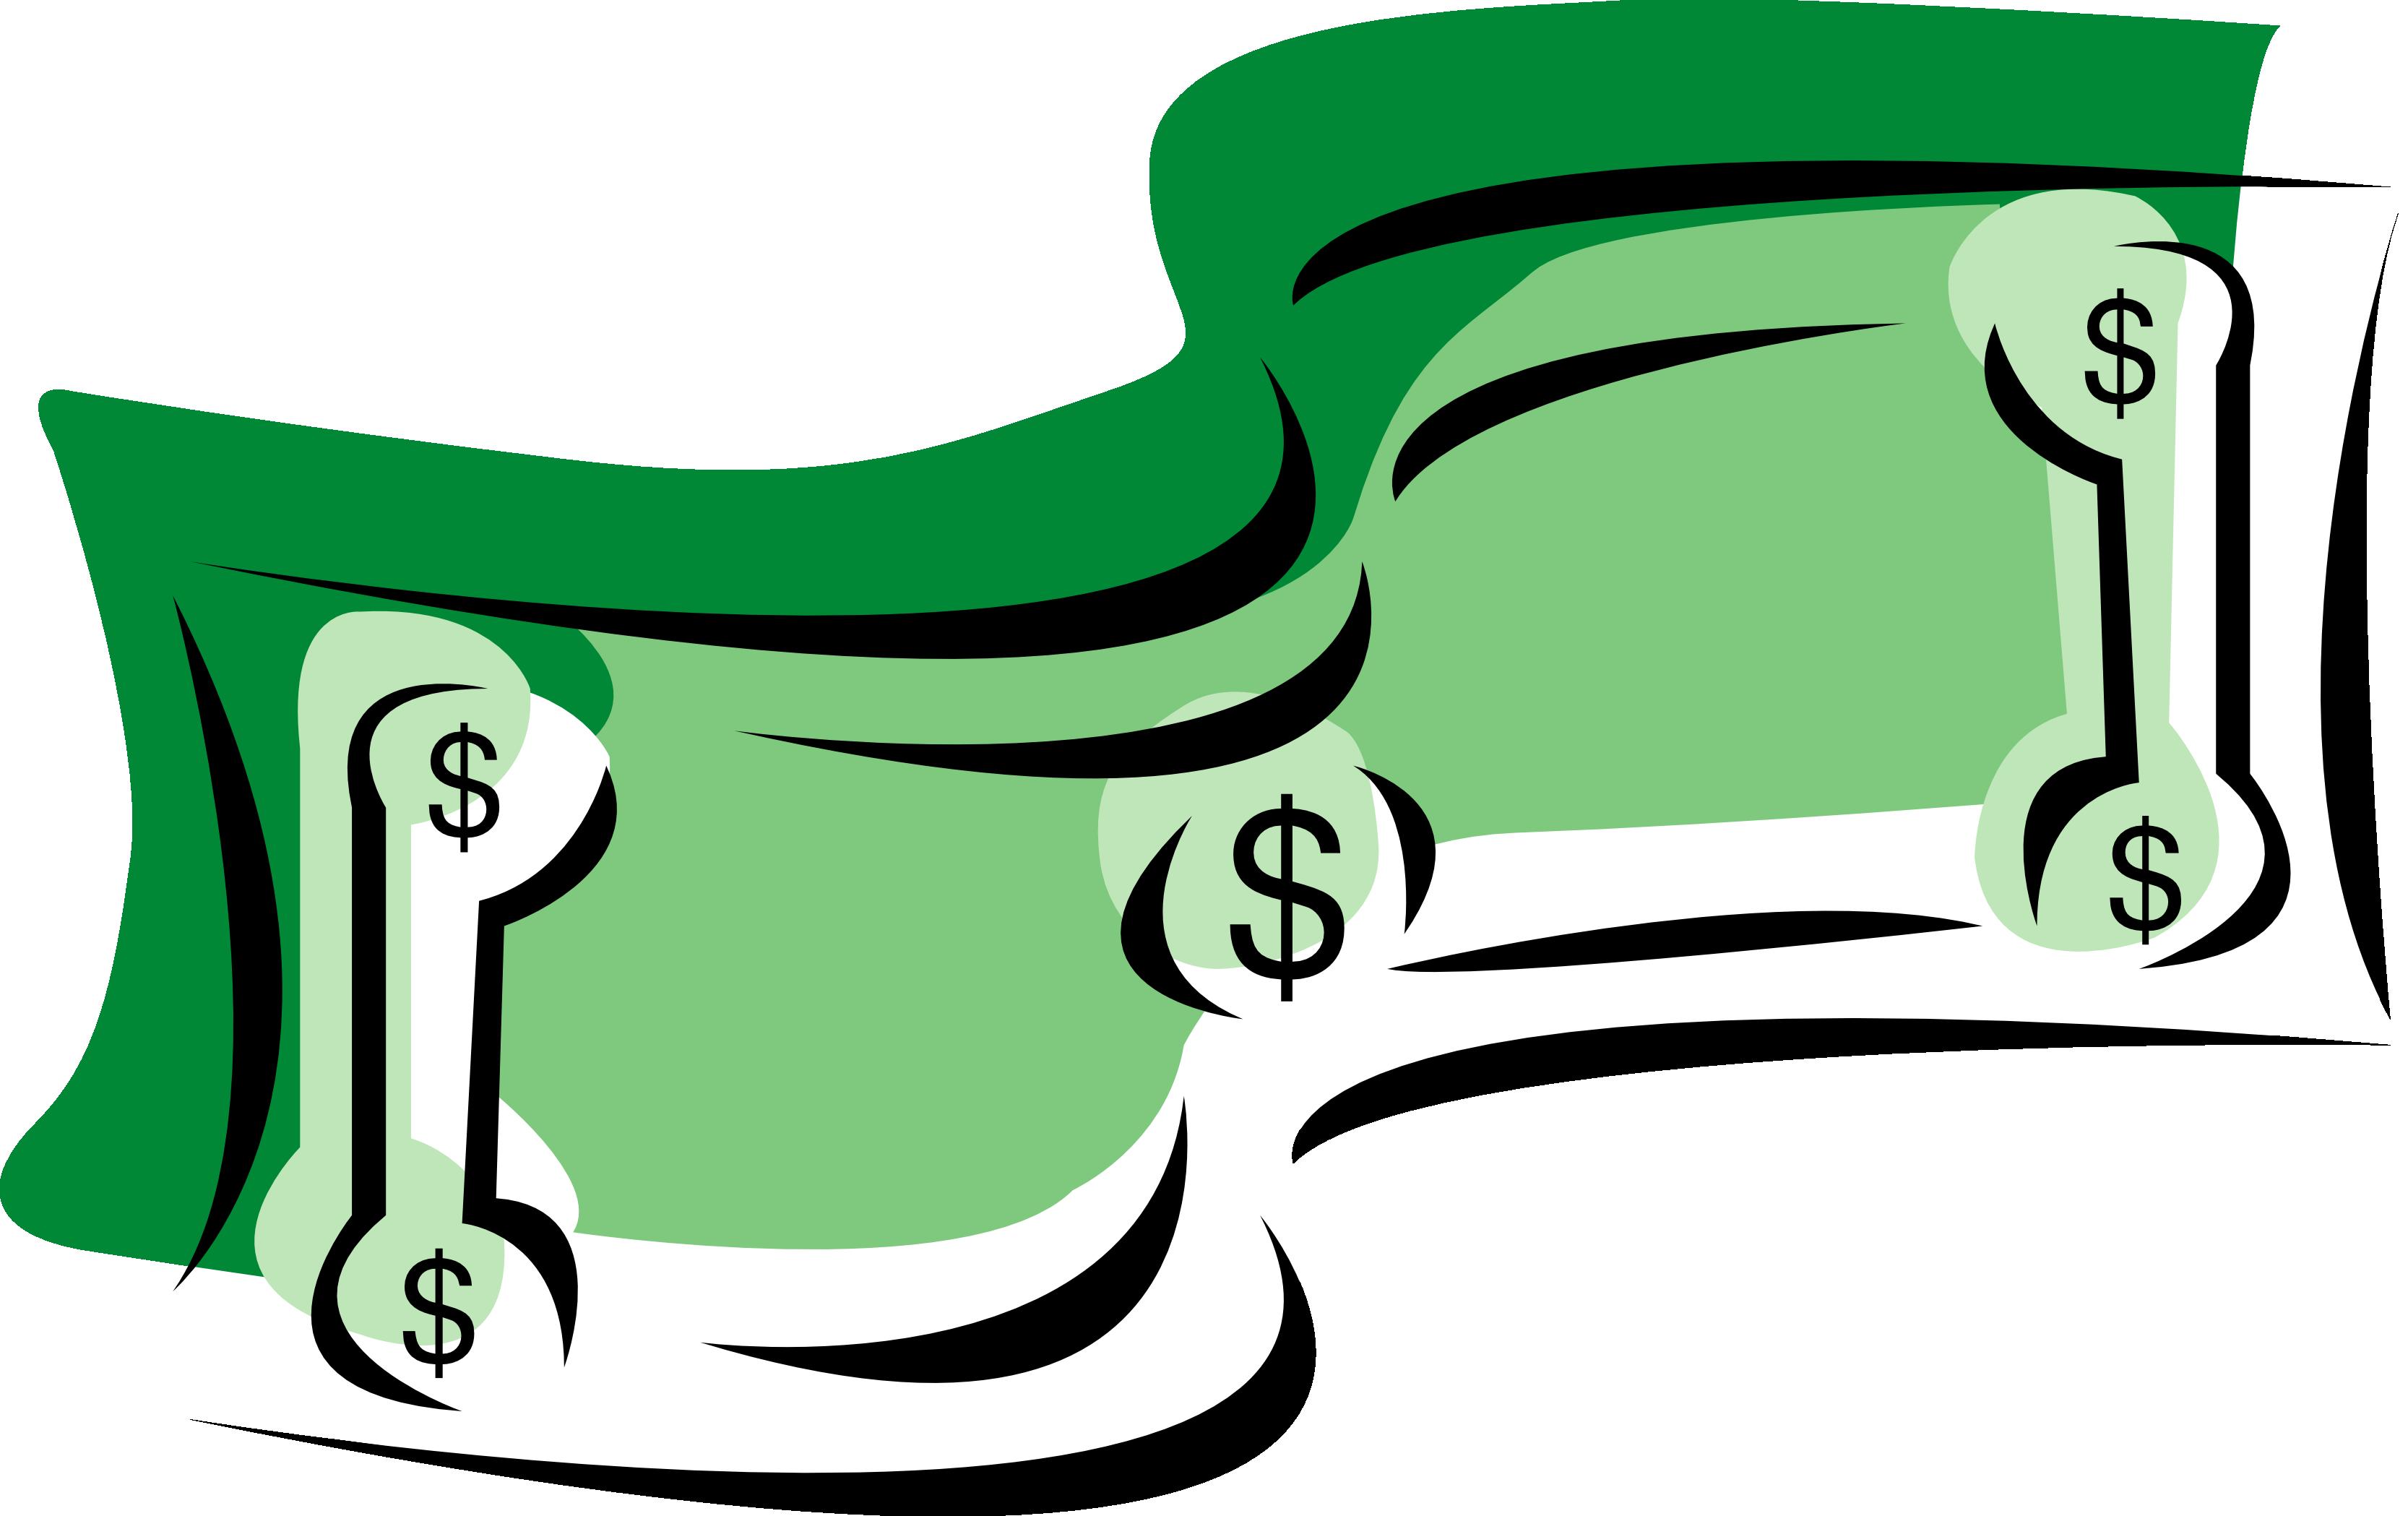 Half Dollar Clipart Clipart P - Dollar Images Clip Art